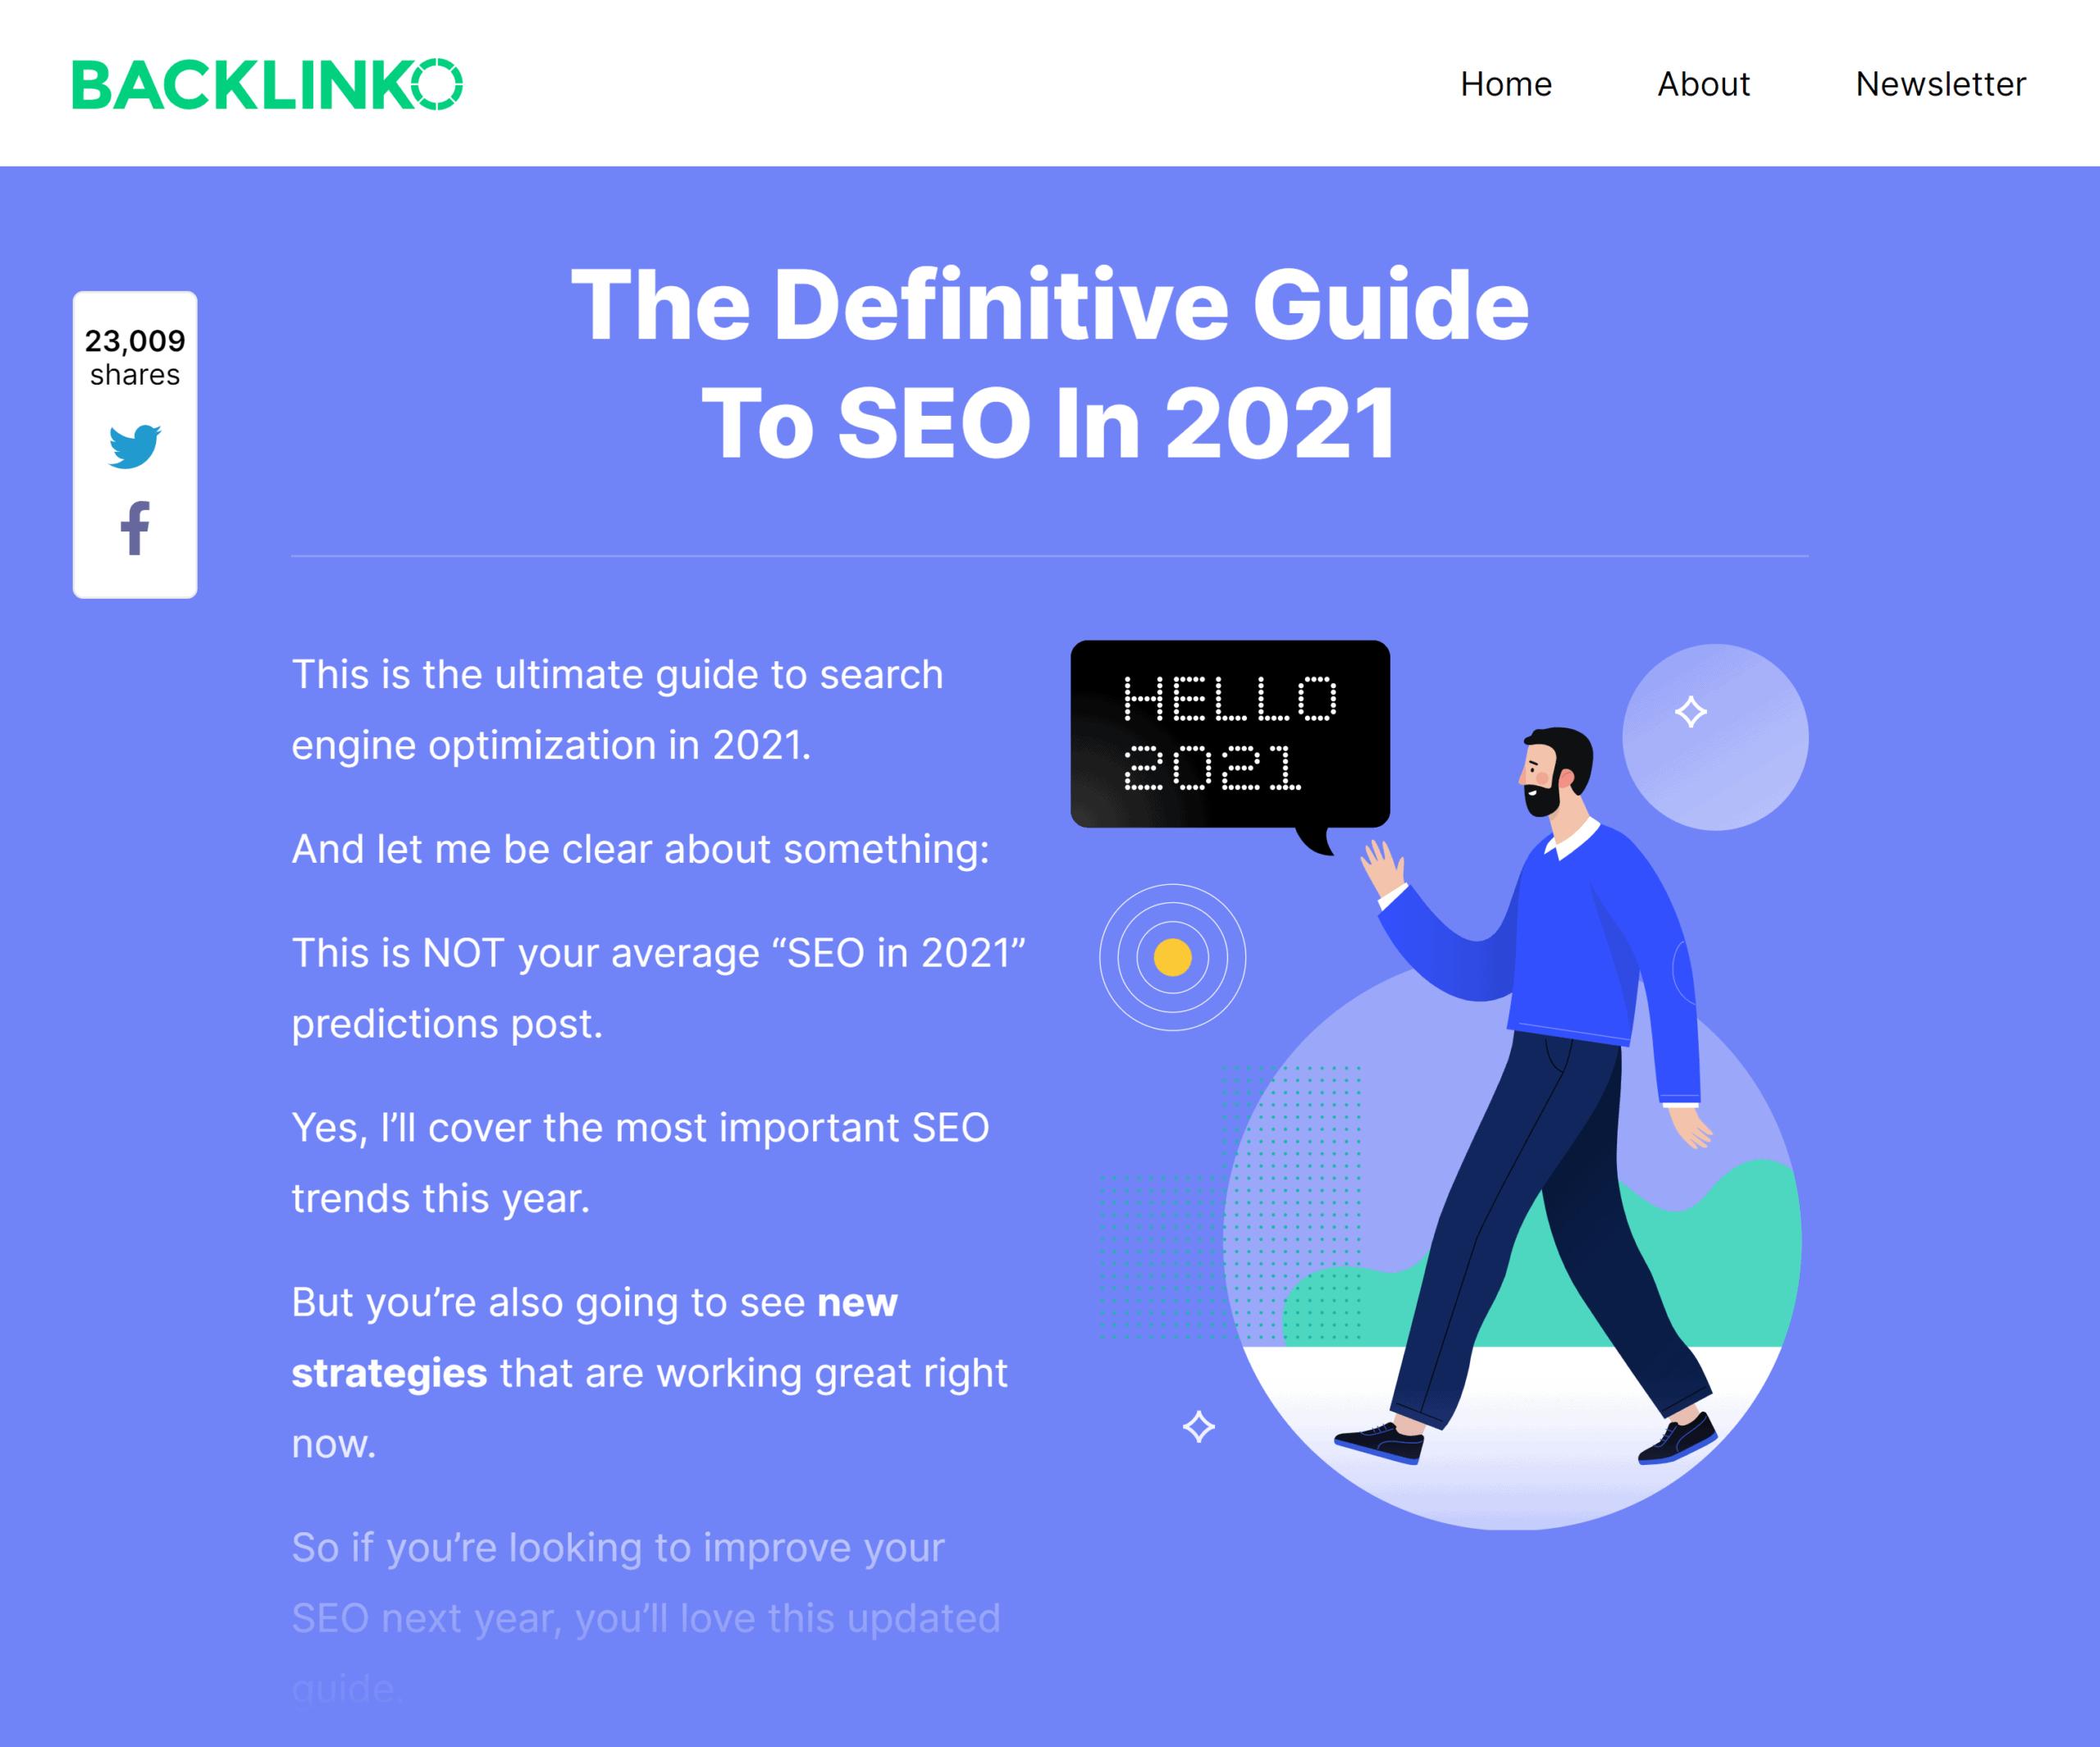 Backlinko – SEO this year